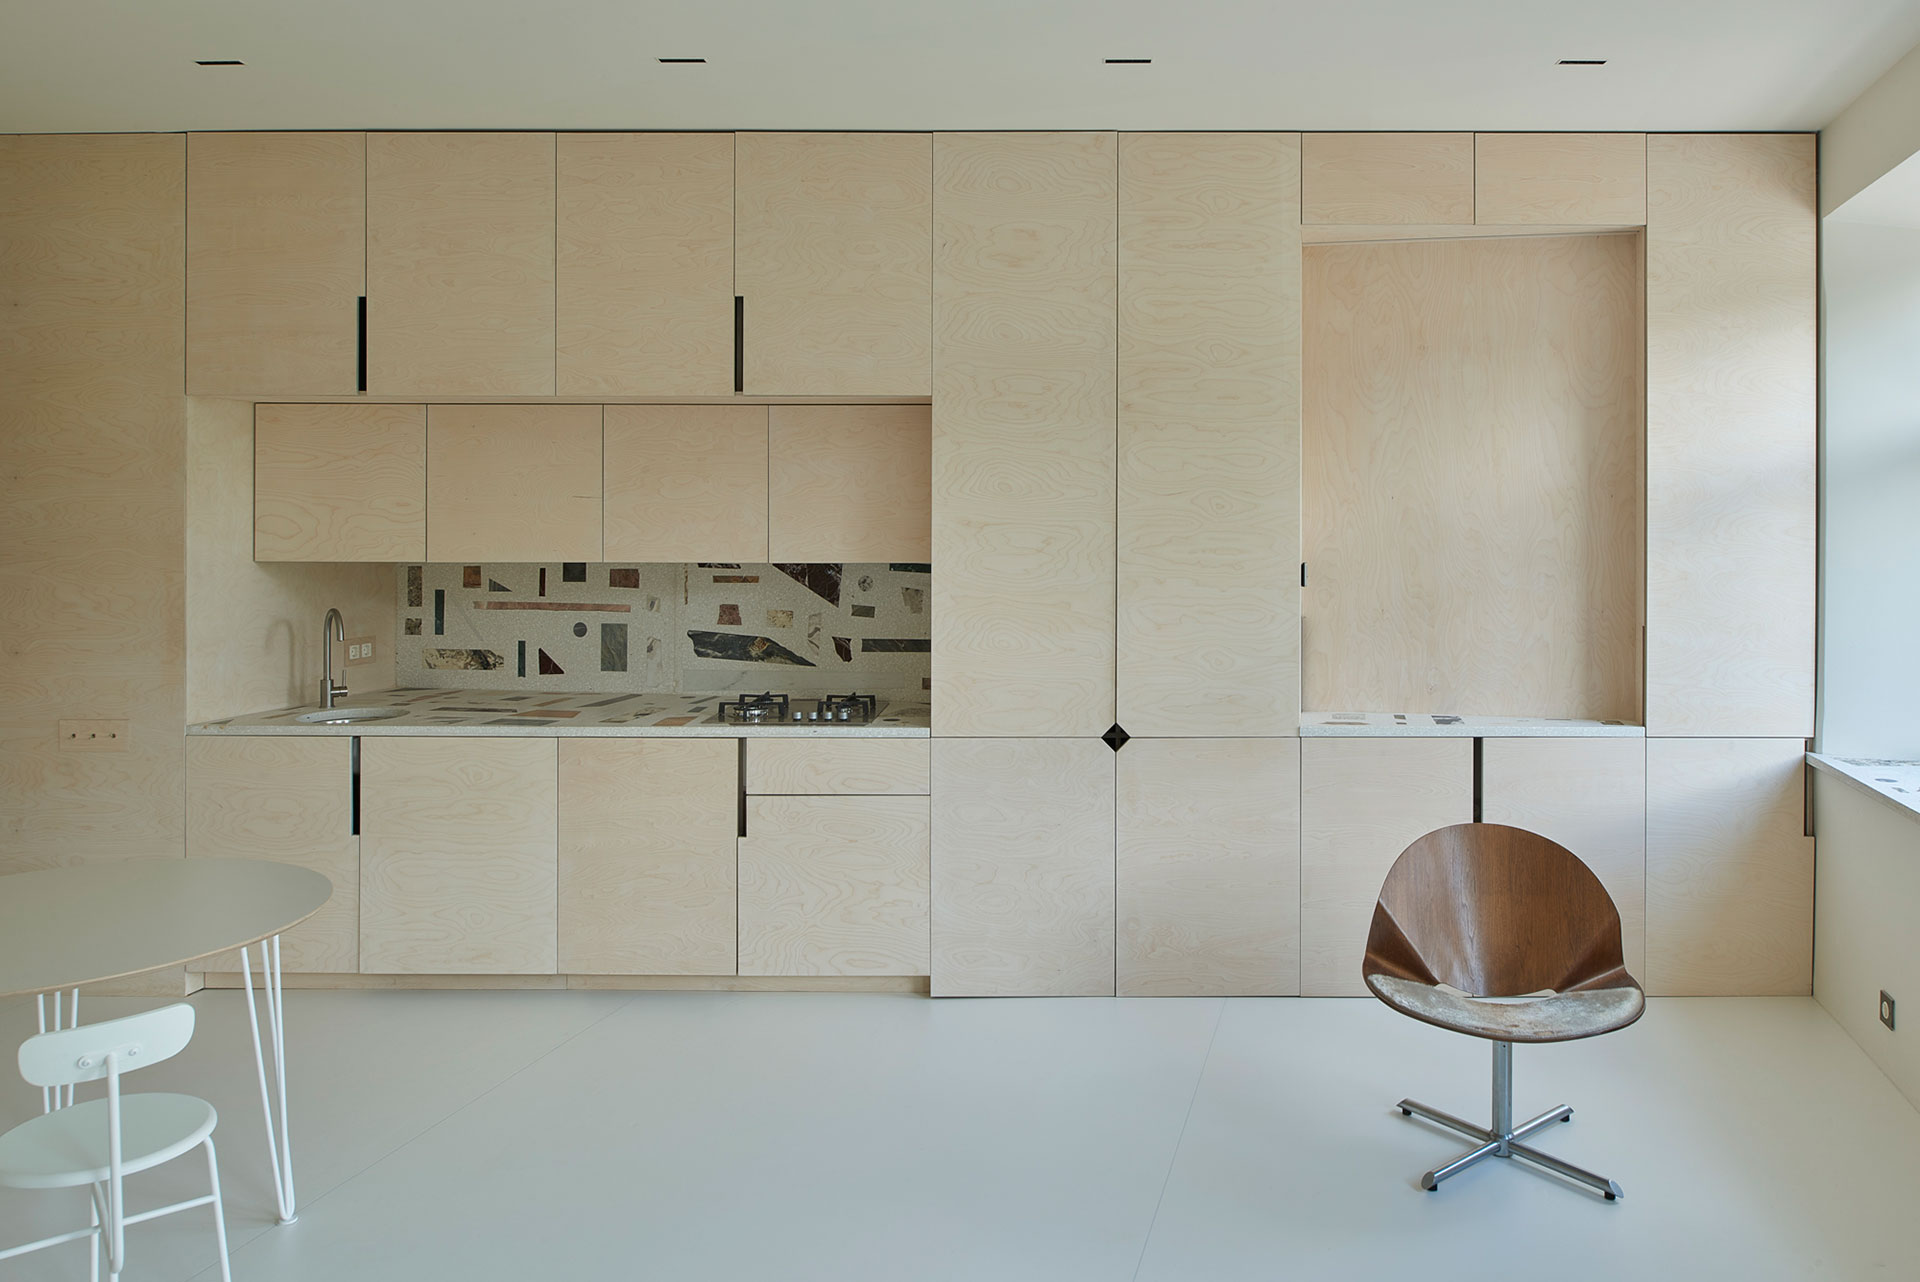 apartamento en vilna de sarkauskai architecture atelier (0) - foto darius petrulaitis